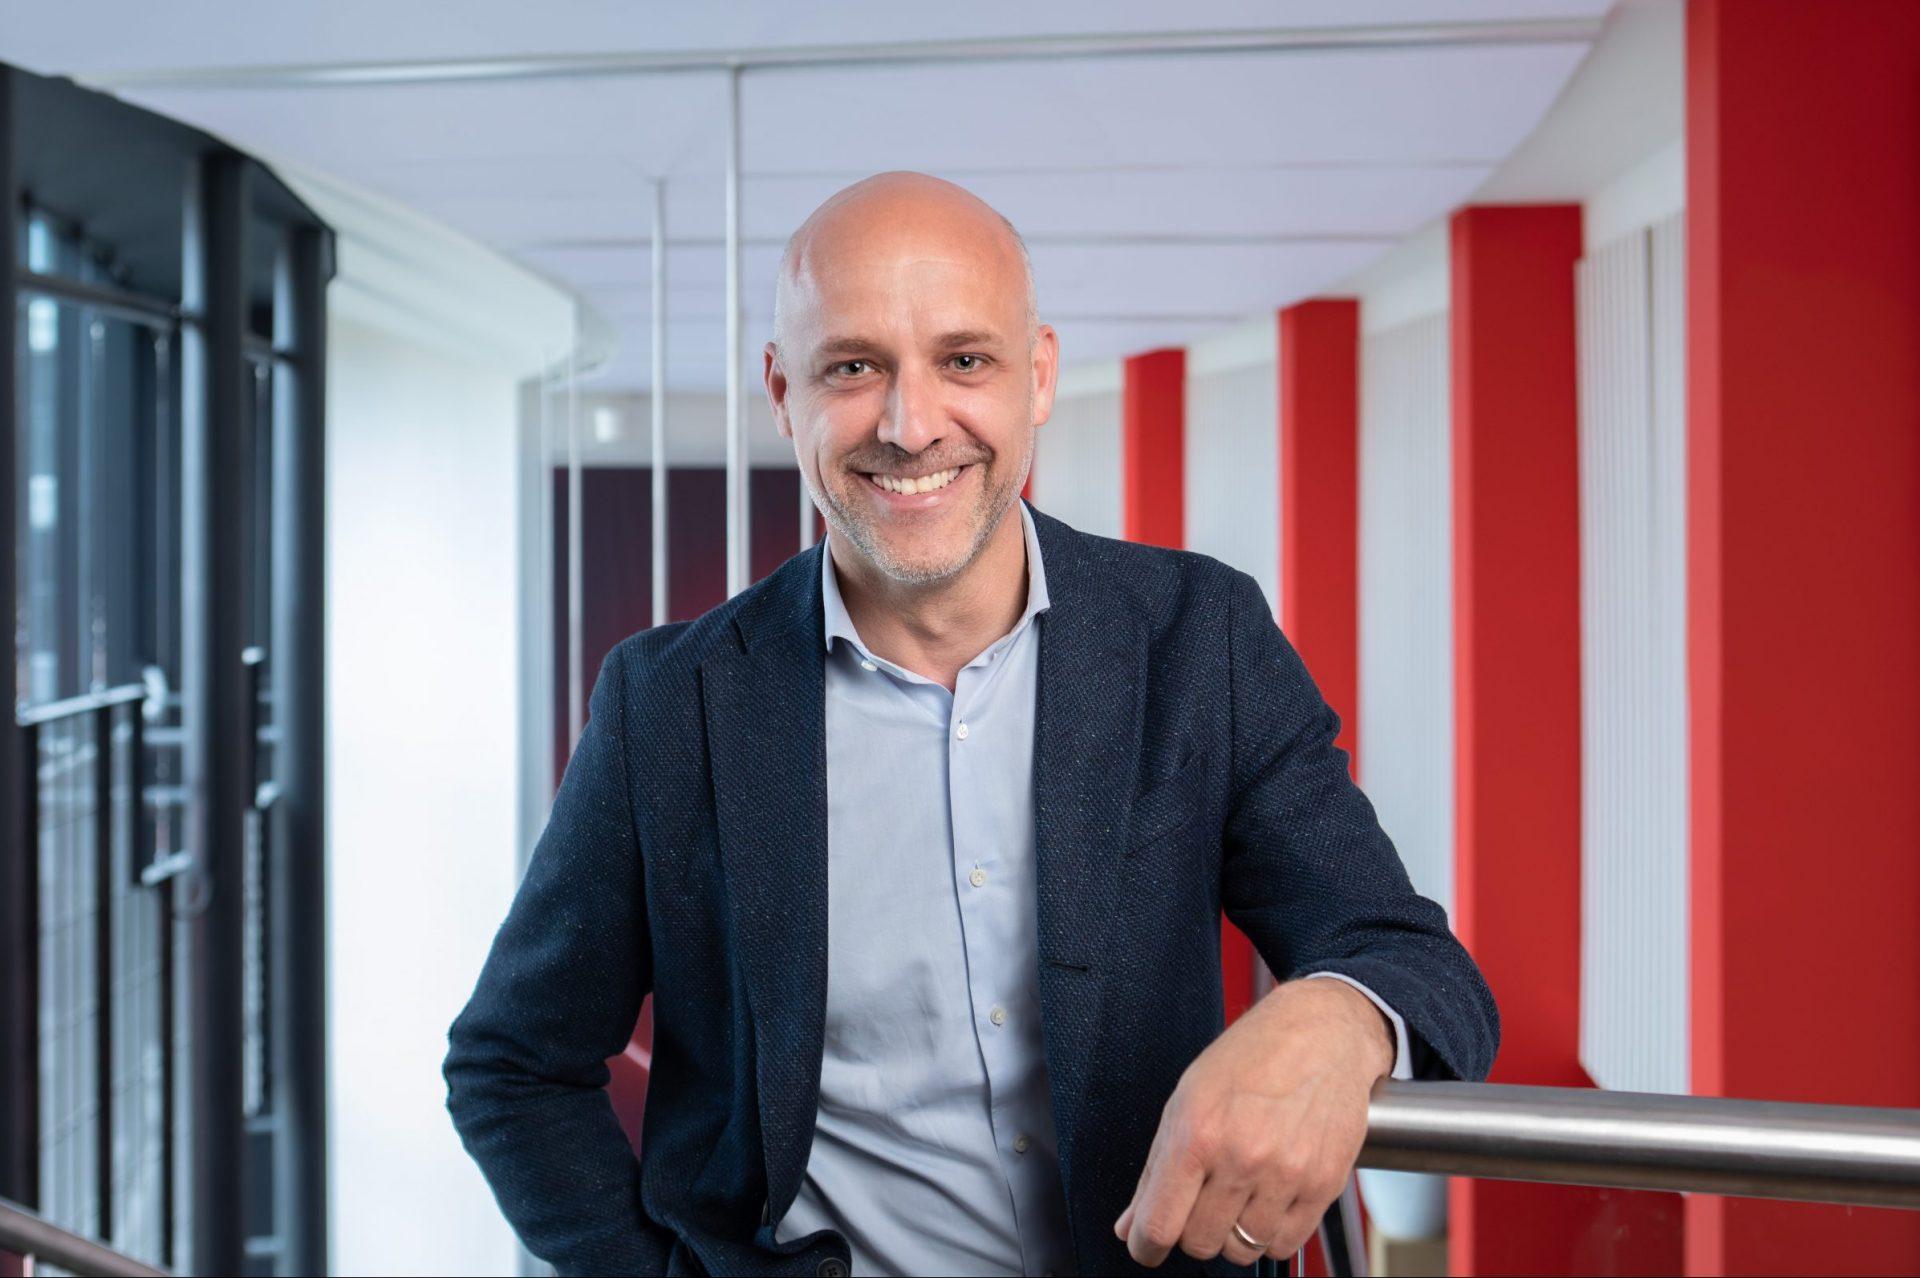 Andrea Dona, Network & Development Director, Vodafone UK